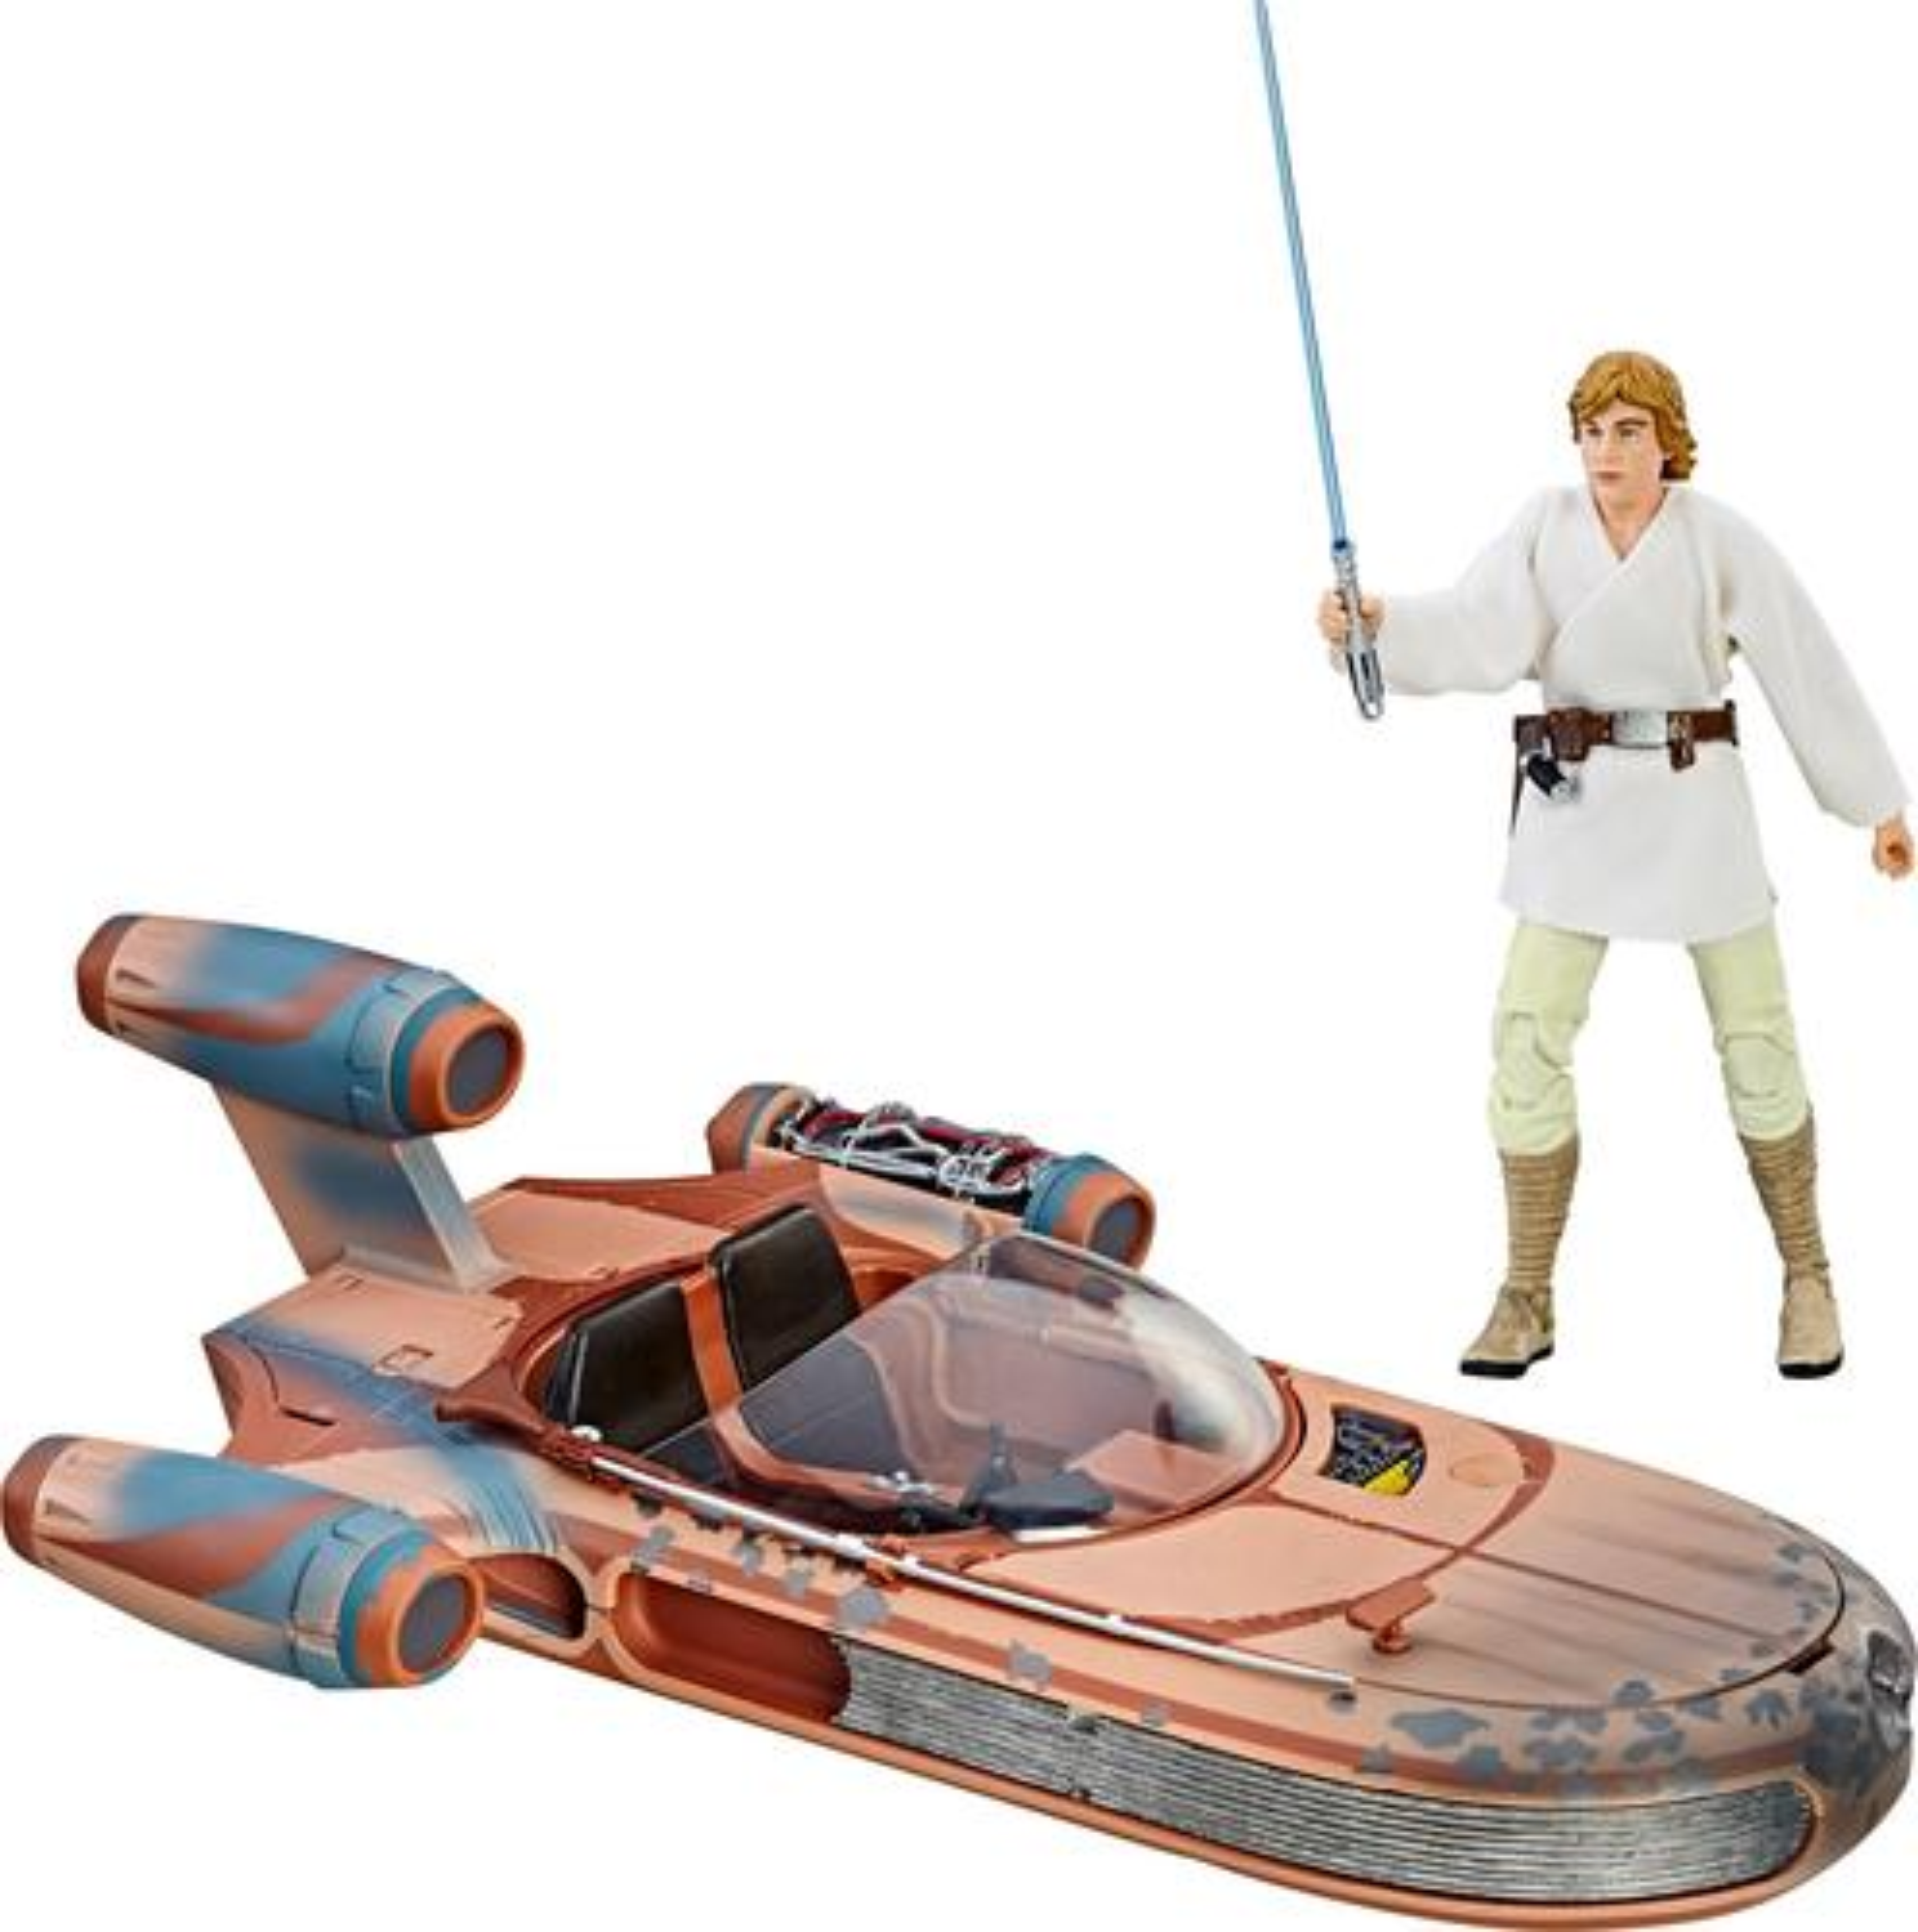 Star Wars - The Black Series Luke Skywalker Landspeeder & Figure 5990414